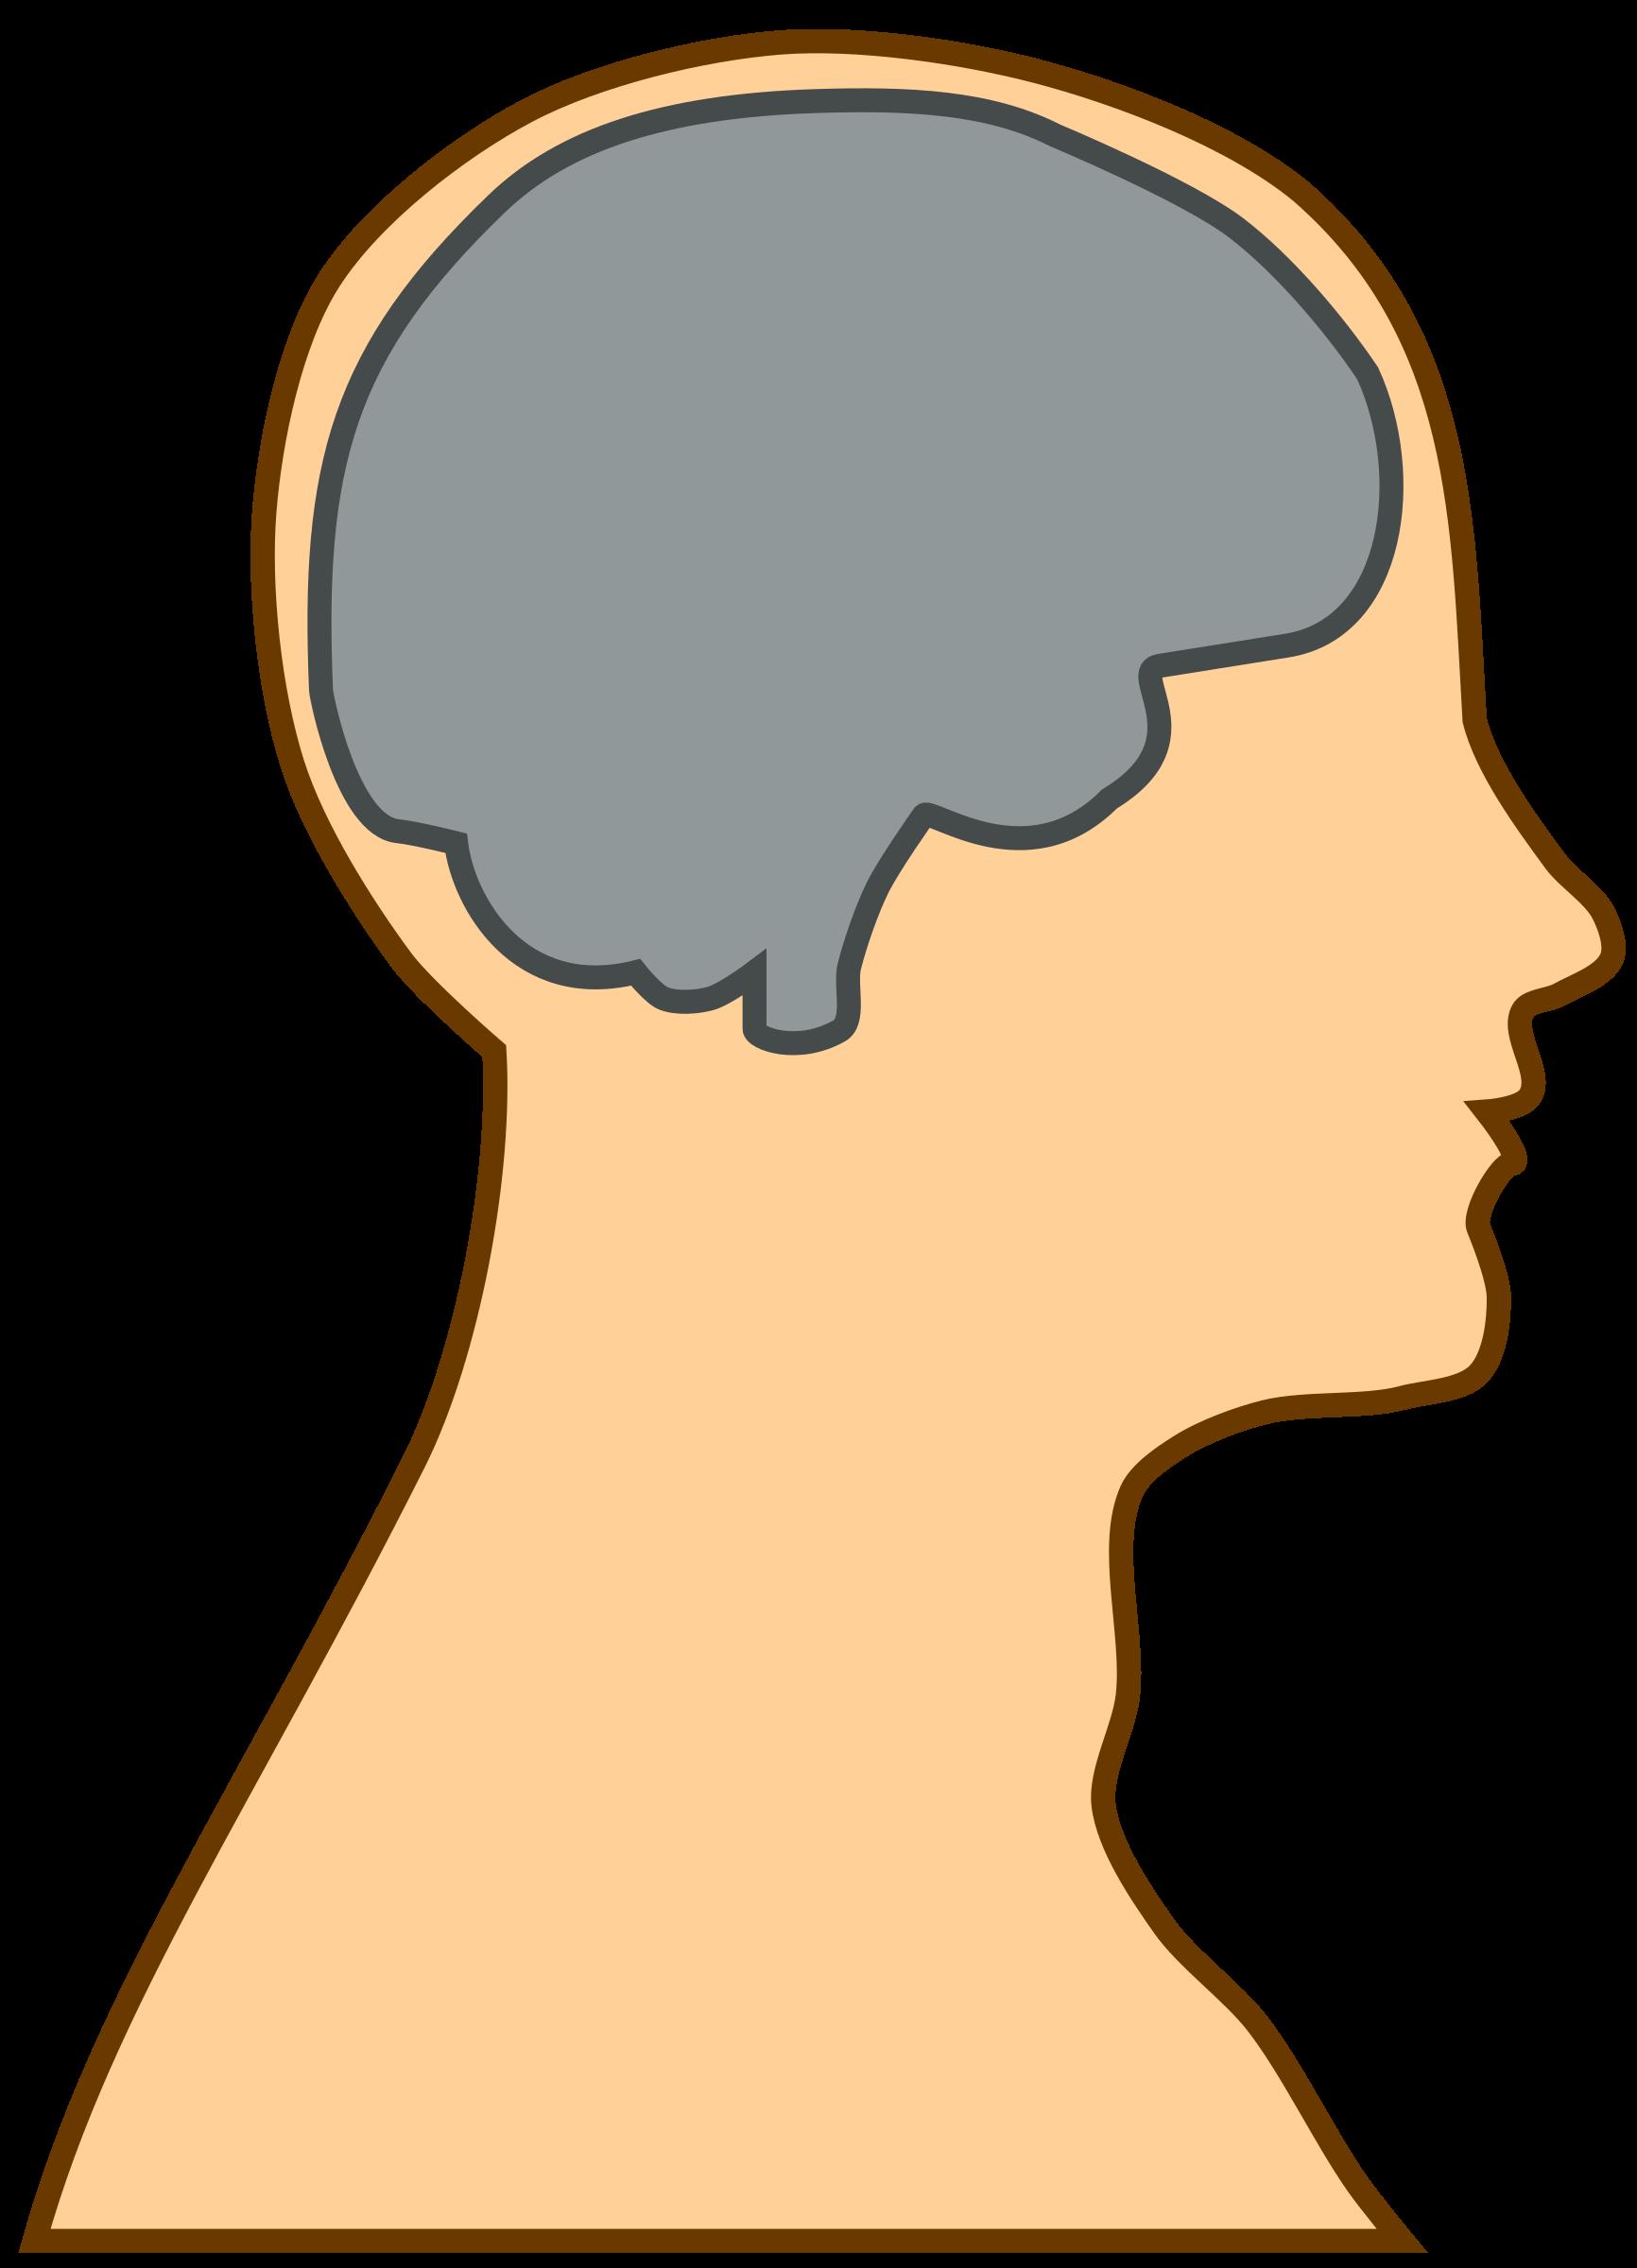 jpg free download Silhouette at getdrawings com. Brain clipart human brain